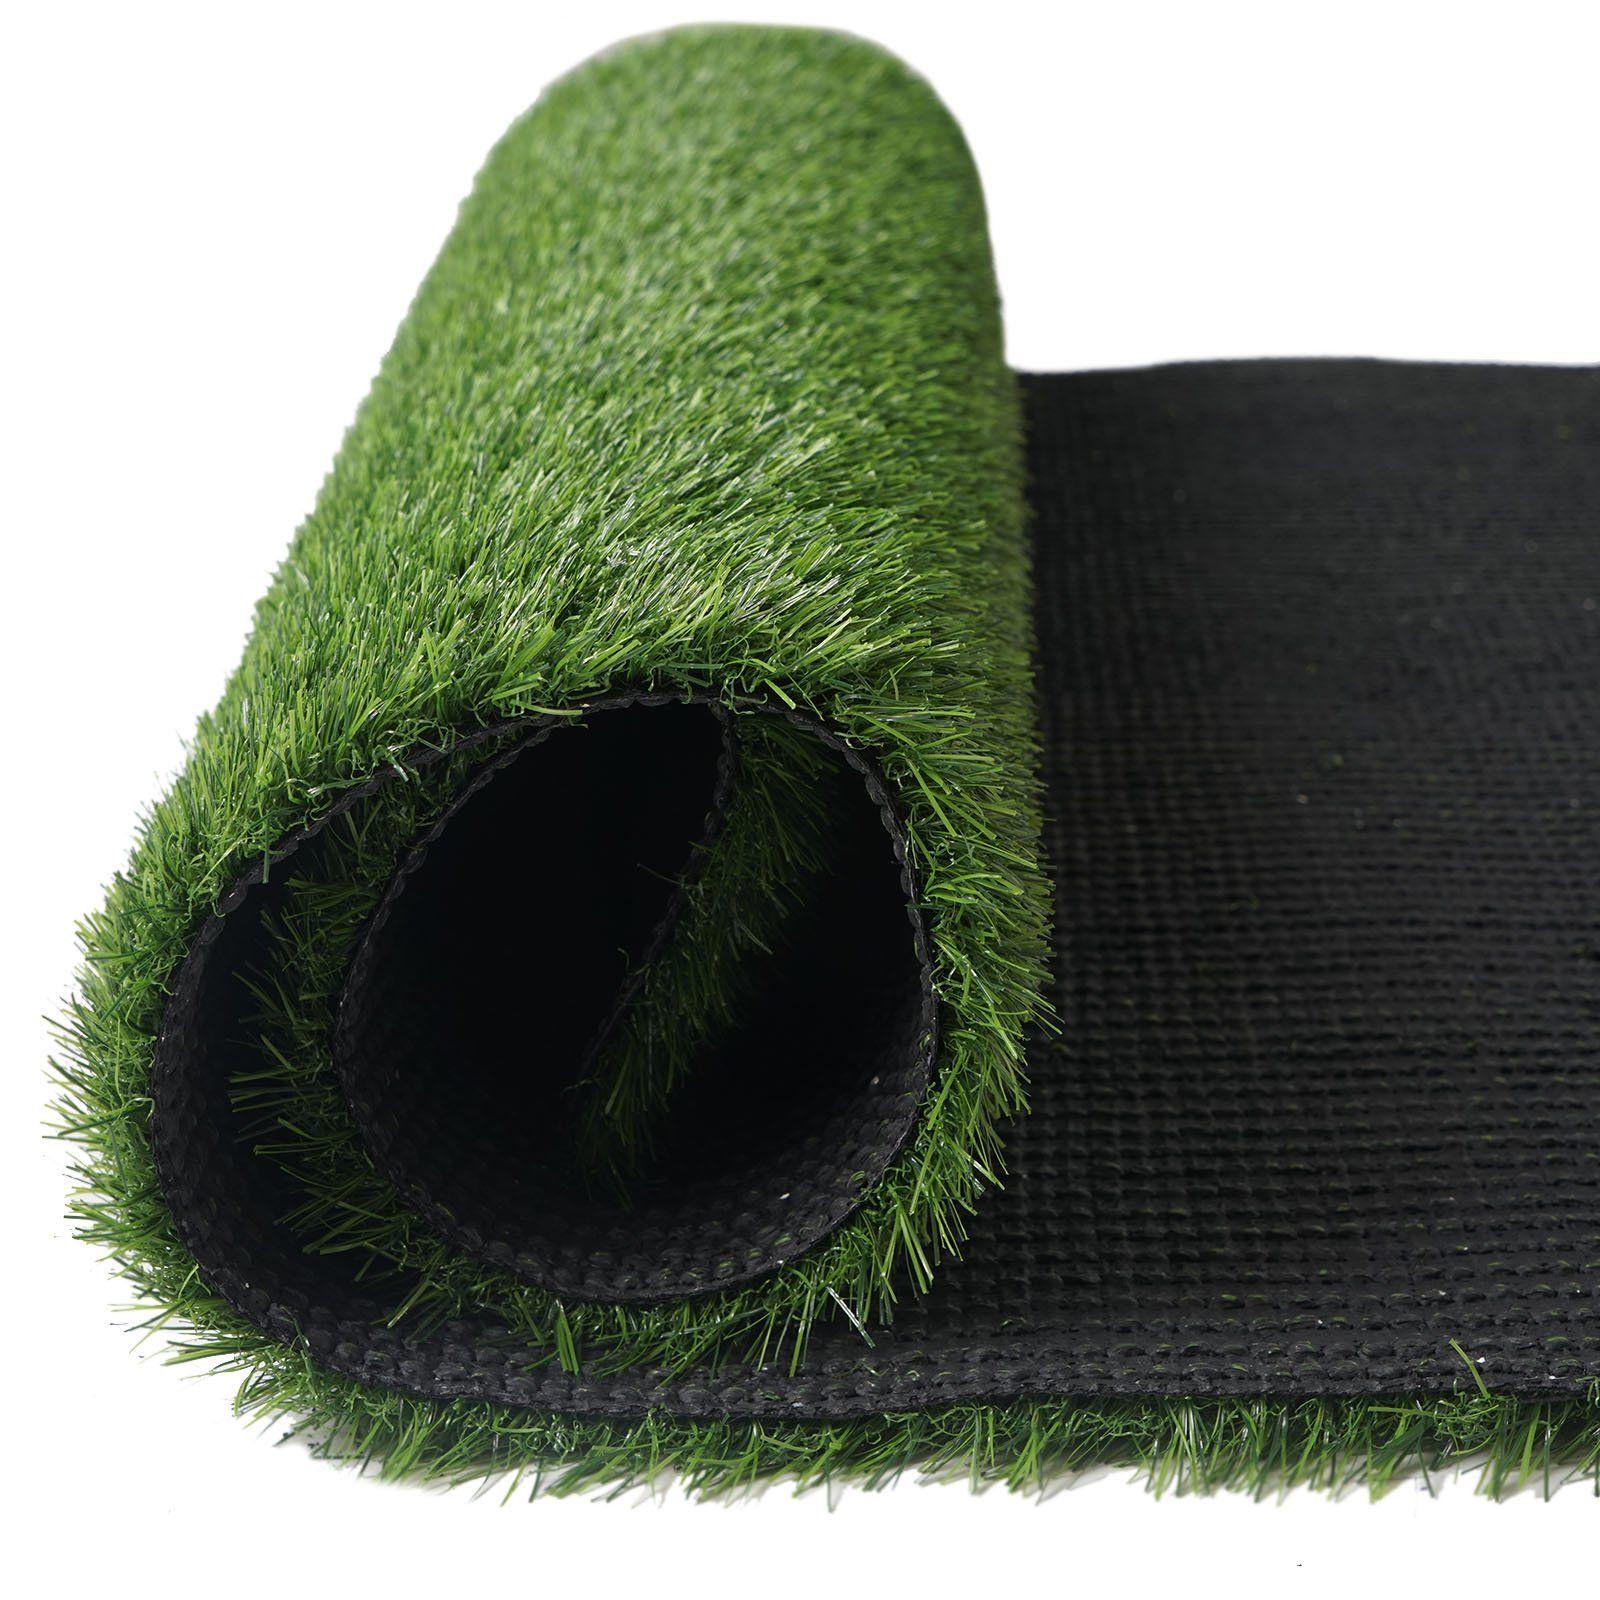 Artificial Grass Wholesale 5 Ft X 3 Ft Synthetic Grass Rugs Indoor Outdoor Turf Carpet Plastic Grass Grass Carpet Grass Rug